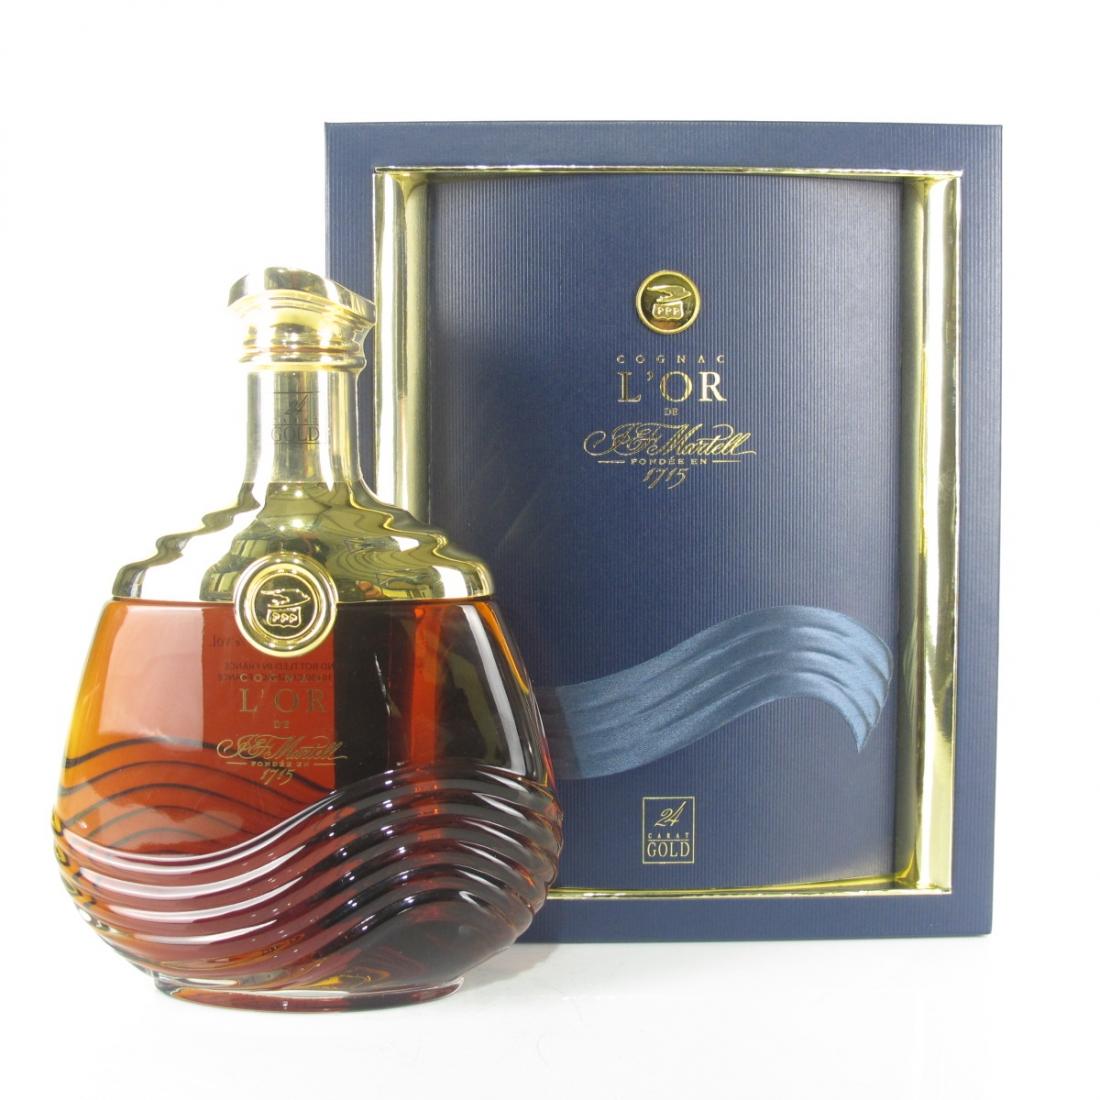 Martell l'Or De Cognac Decanter